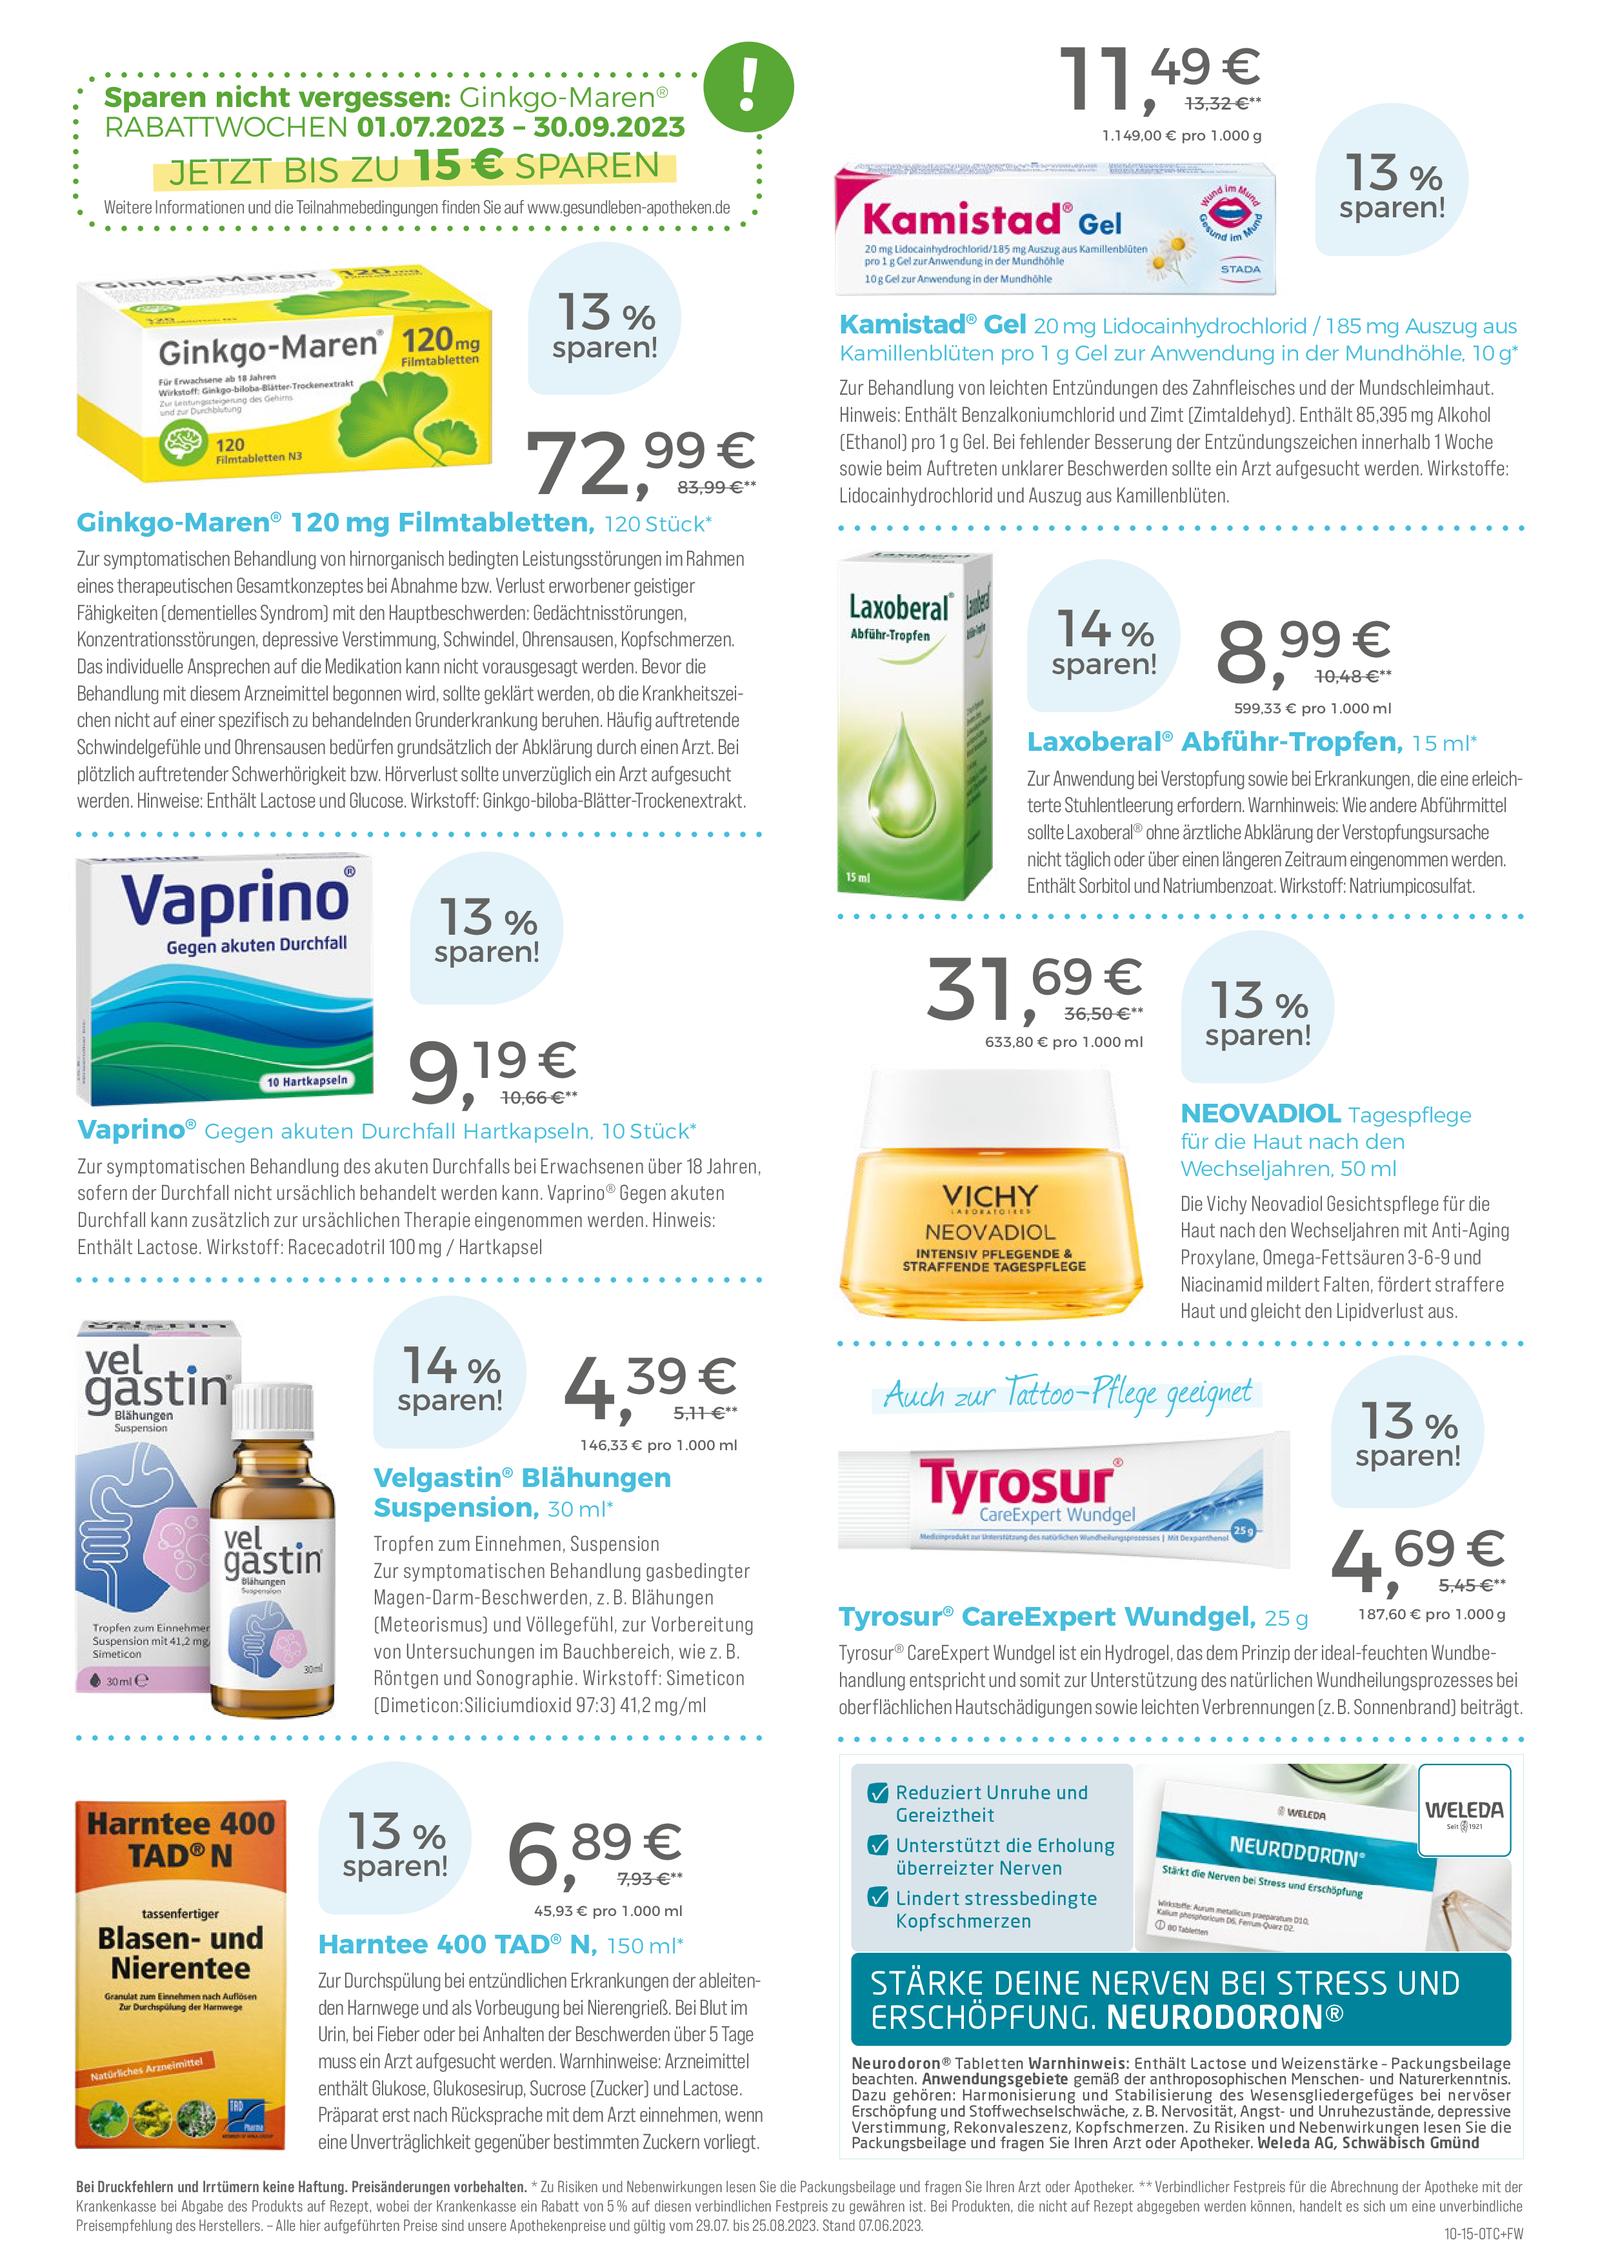 https://mein-uploads.apocdn.net/14114/leaflets/gesundleben_niedrig-Seite3.png